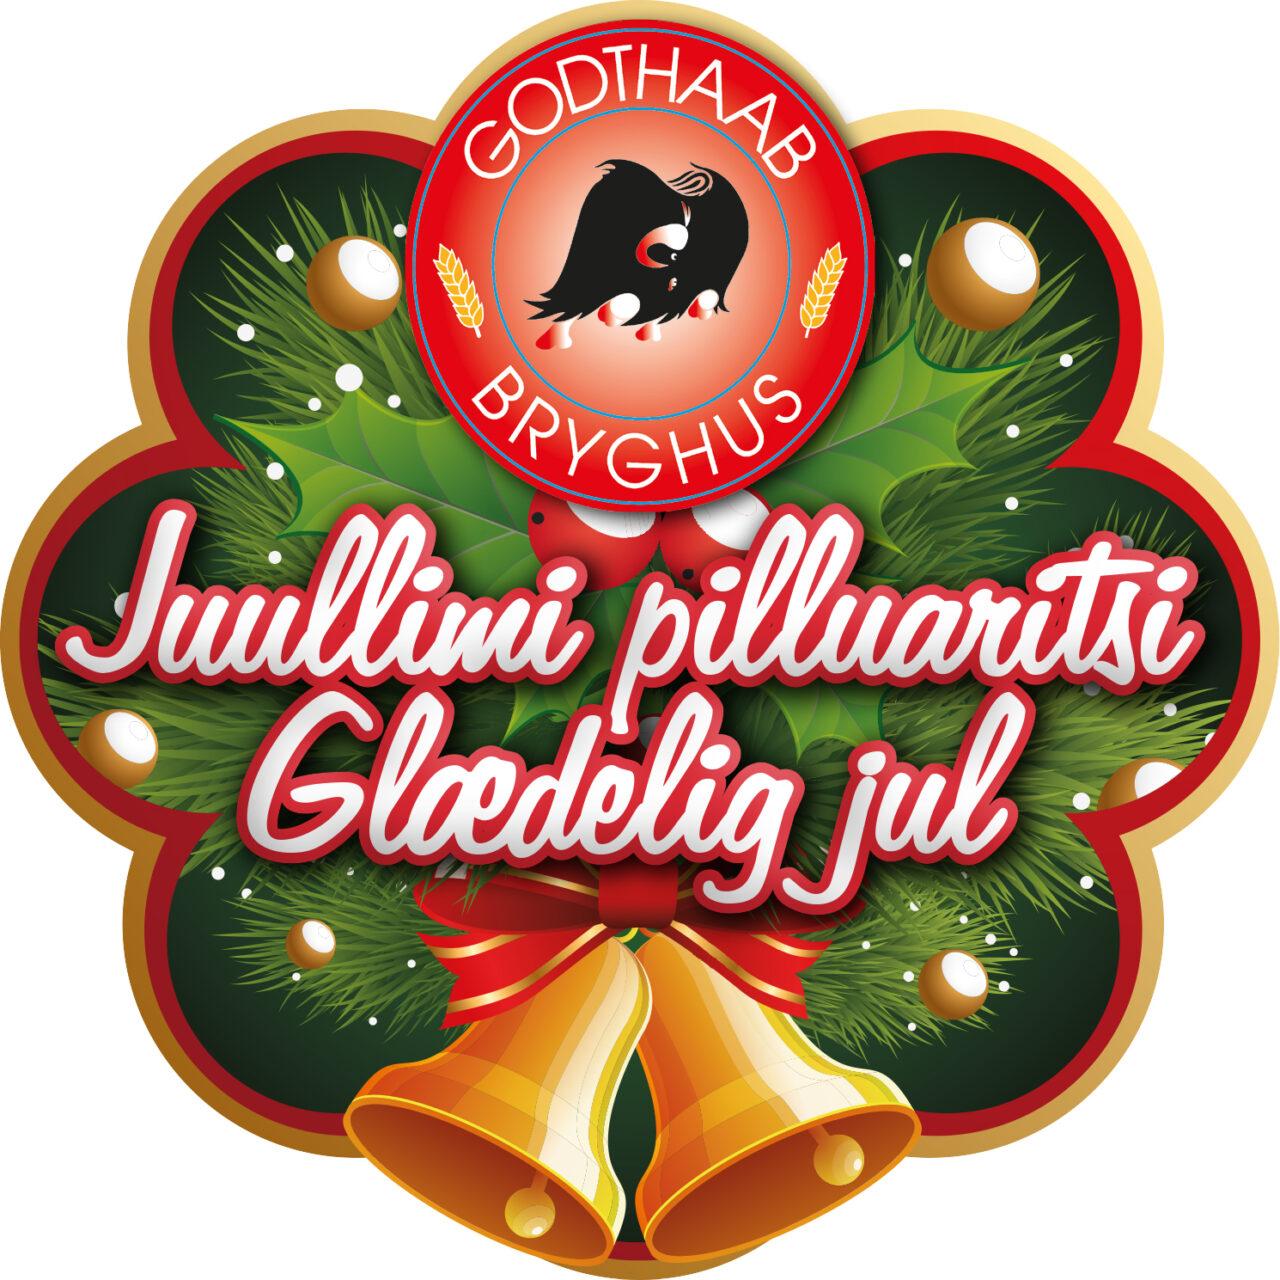 Godthaab Bryghus juleklistermærke